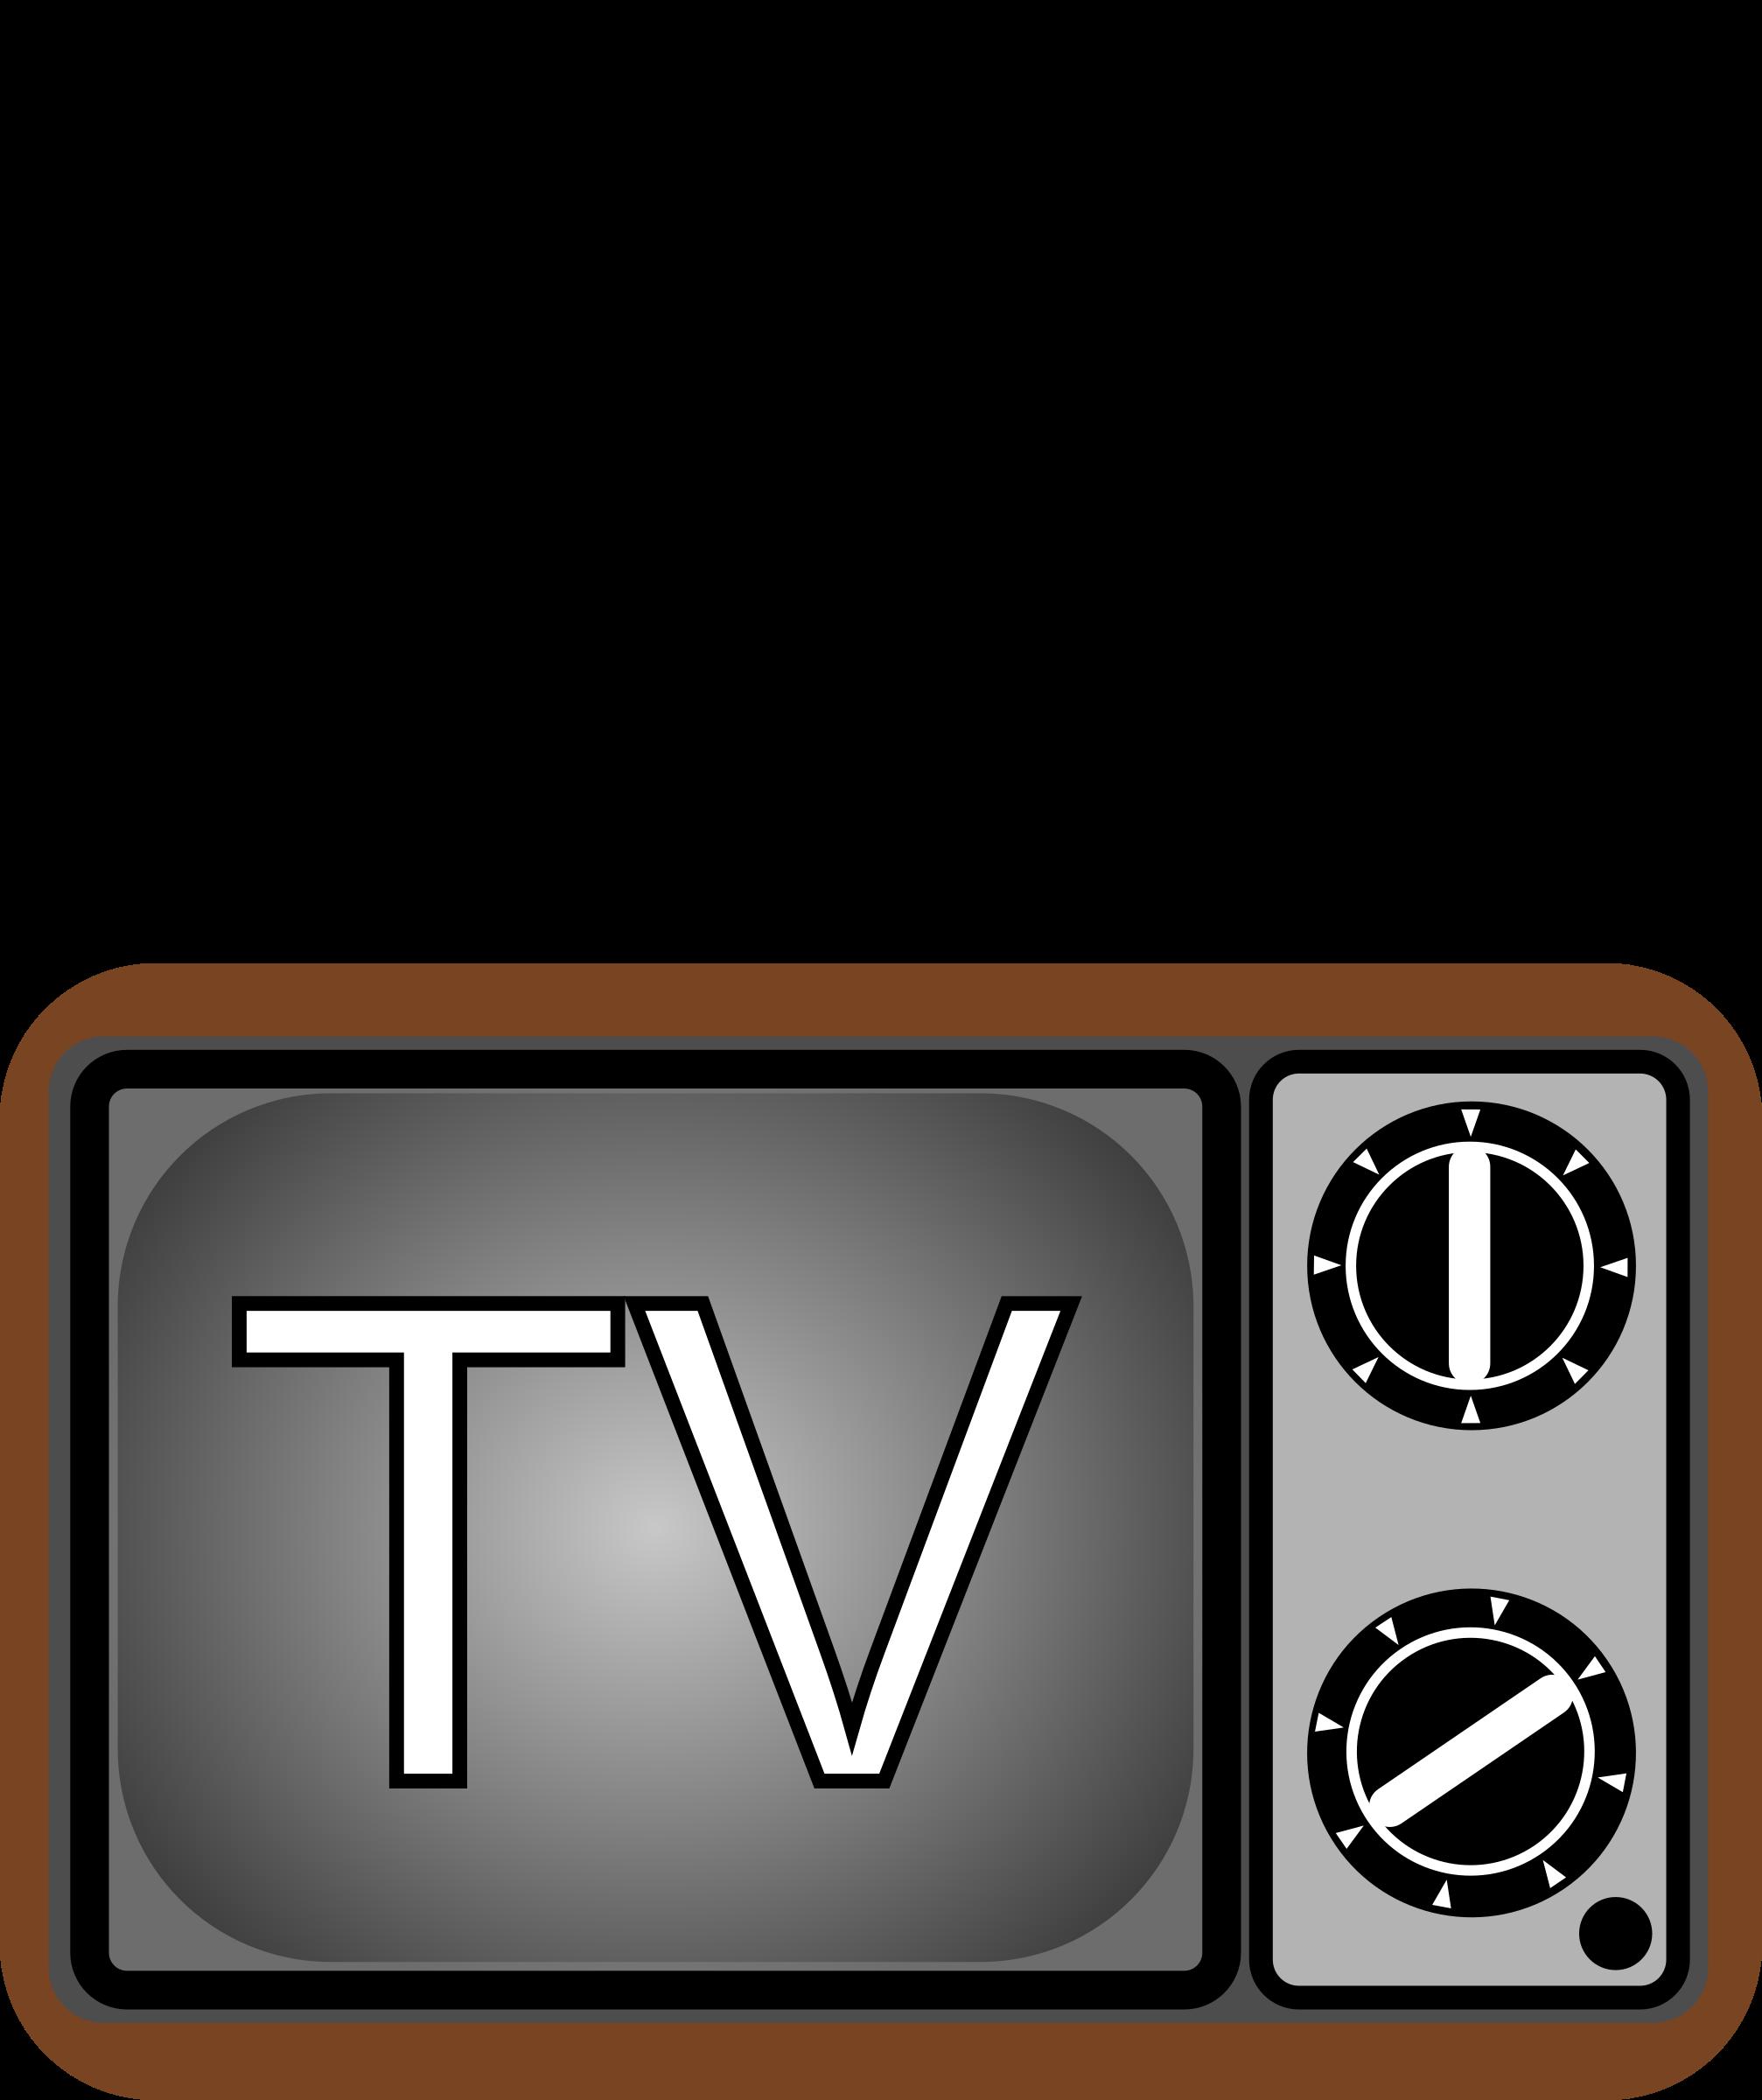 Television big image png. Clipart tv line art